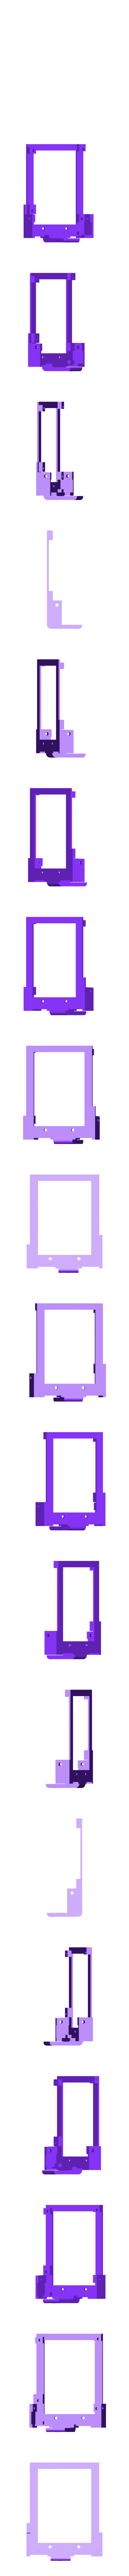 m-body-board_holder.stl Download free STL file Ez Arduino Spidey - 12 DOF Quadruped Robot • 3D printing object, manic-3d-print